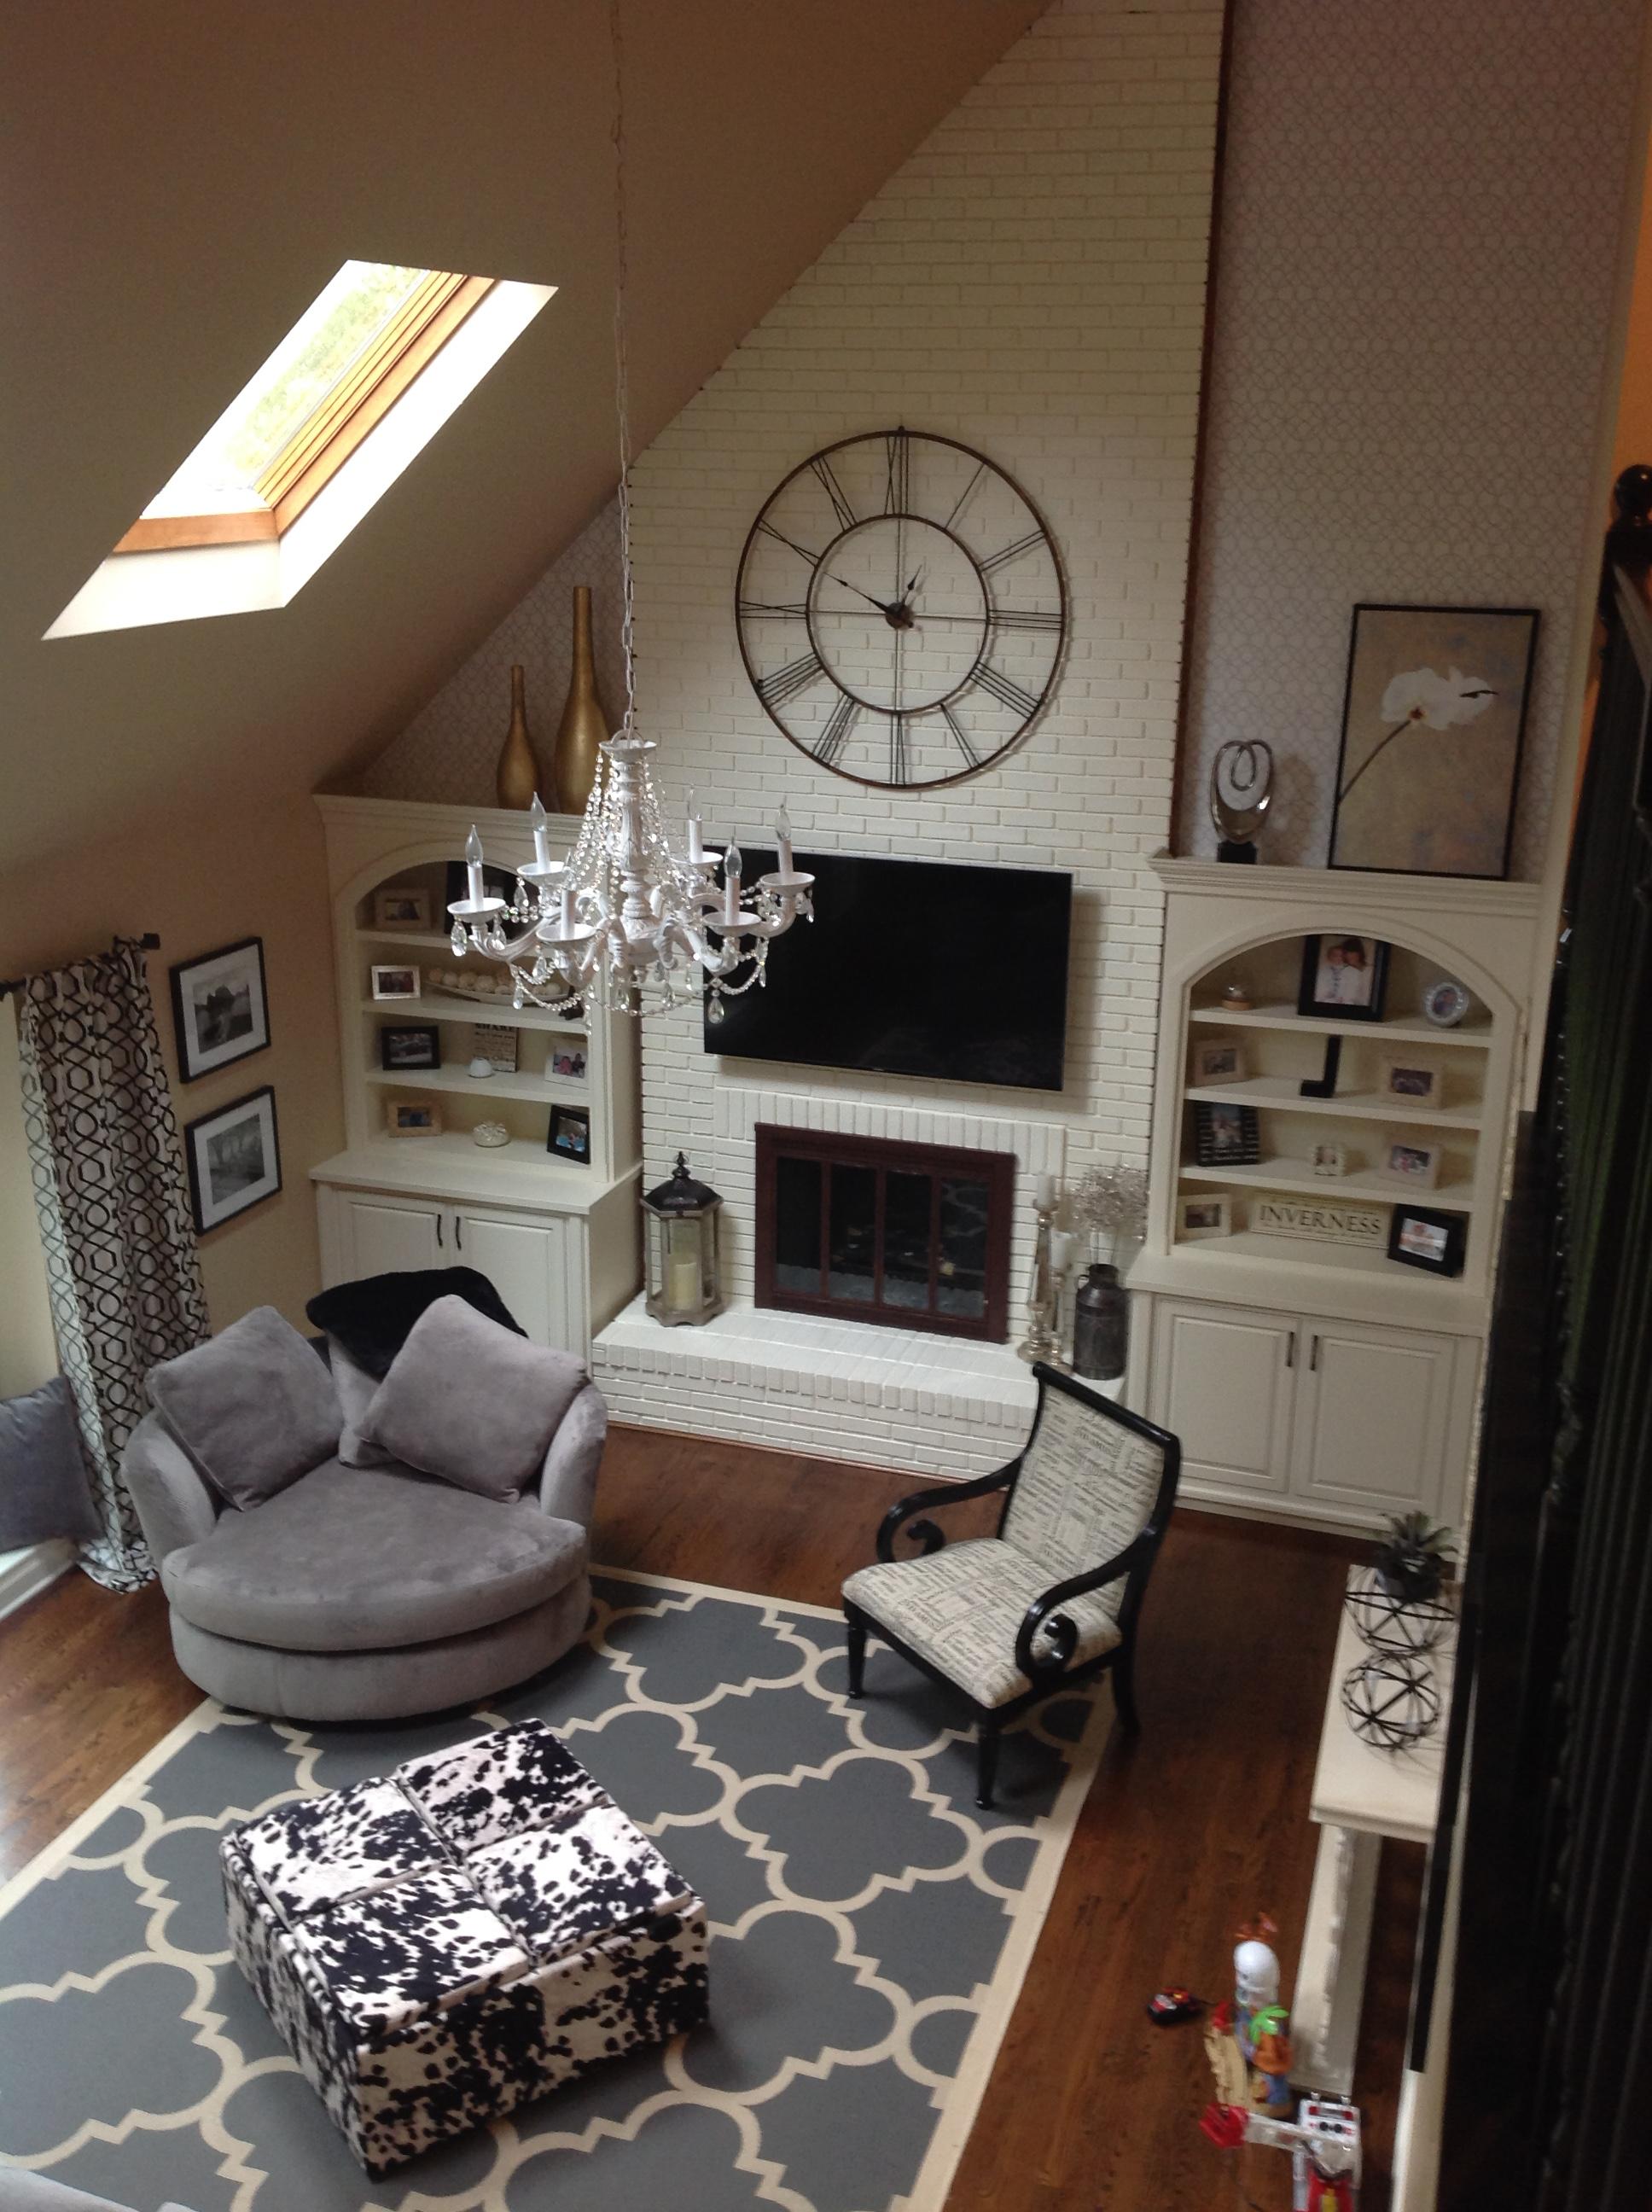 Transitional living room ideas